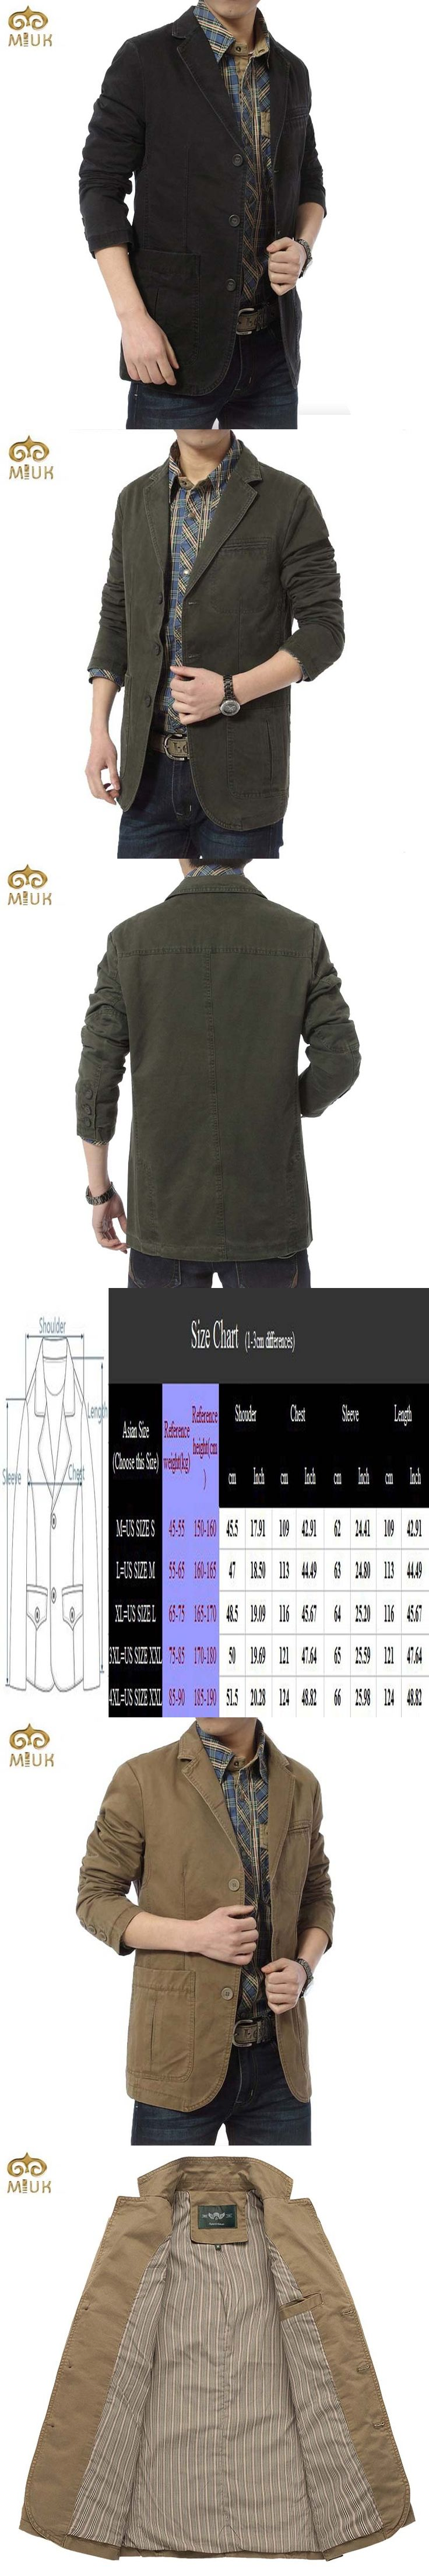 MIUK Brand New blazer Men Casual Blazer Cotton Denim Parka Men's Slim Fit Jackets Army Green Khaki Black Large Size M -XXXXL